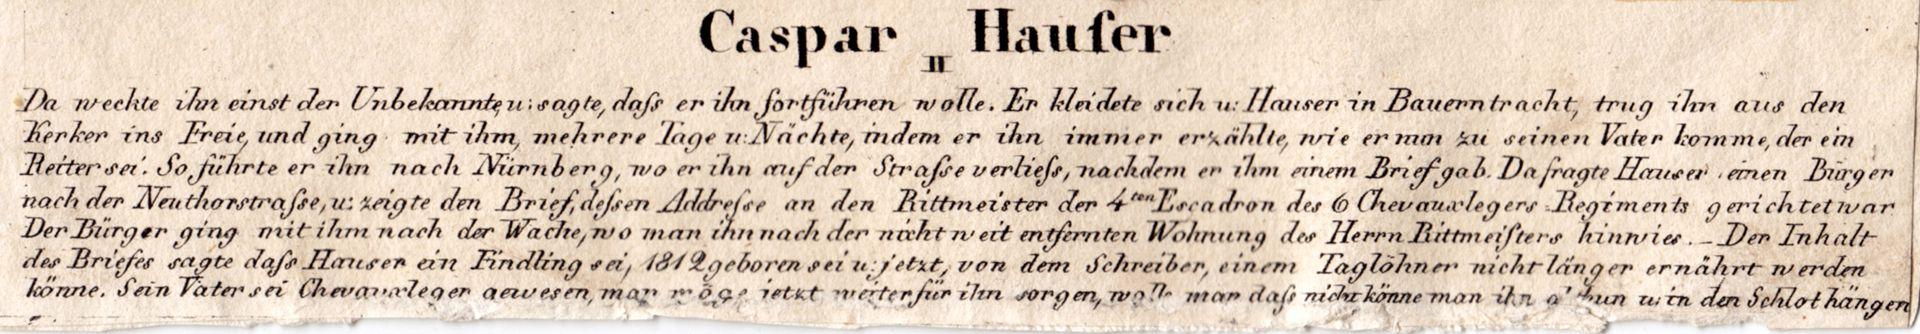 Caspar Hauser II Caption